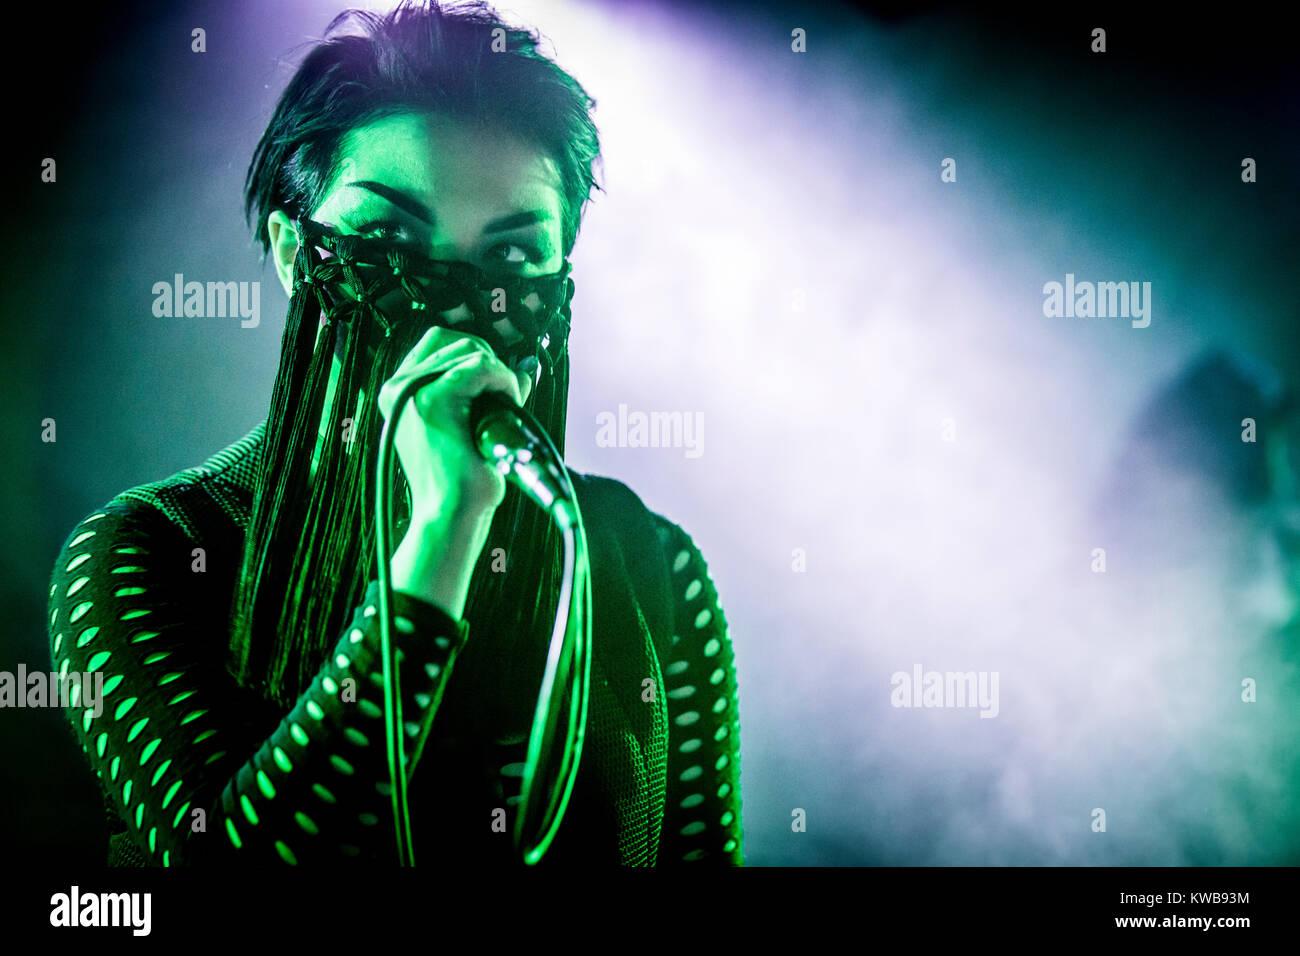 The Danish electro-pop singer Mendoza performs a live